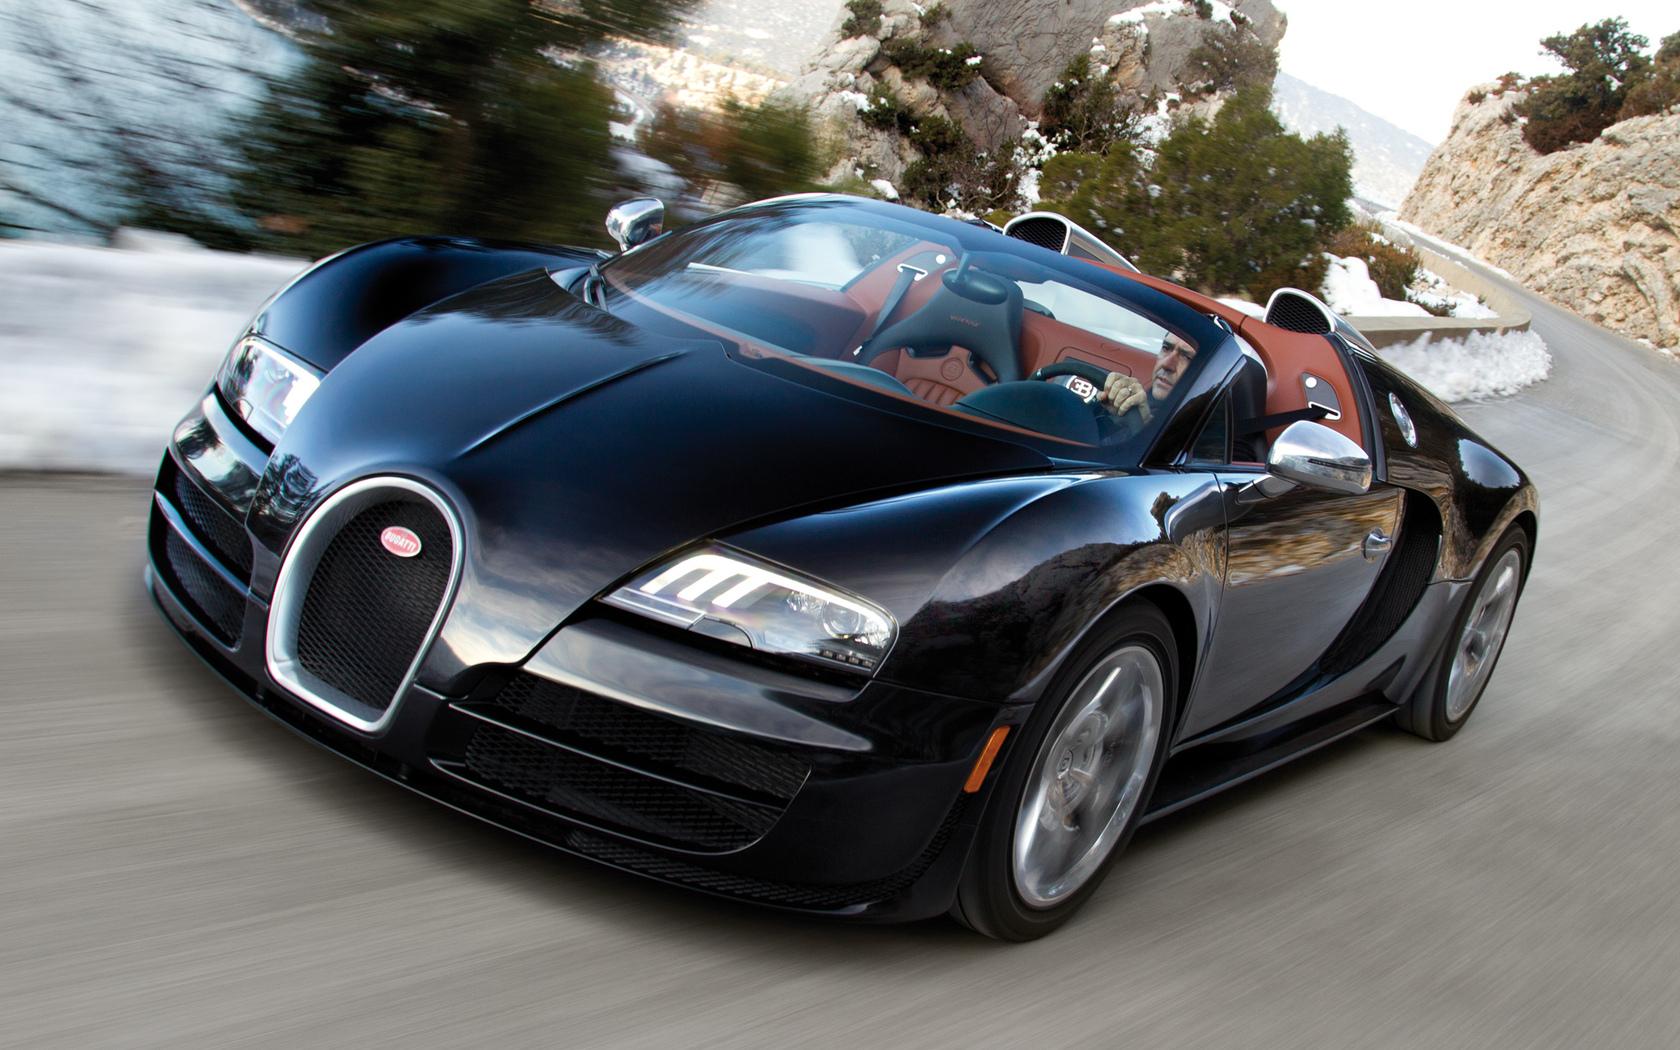 side airbags, stability control, bugatti